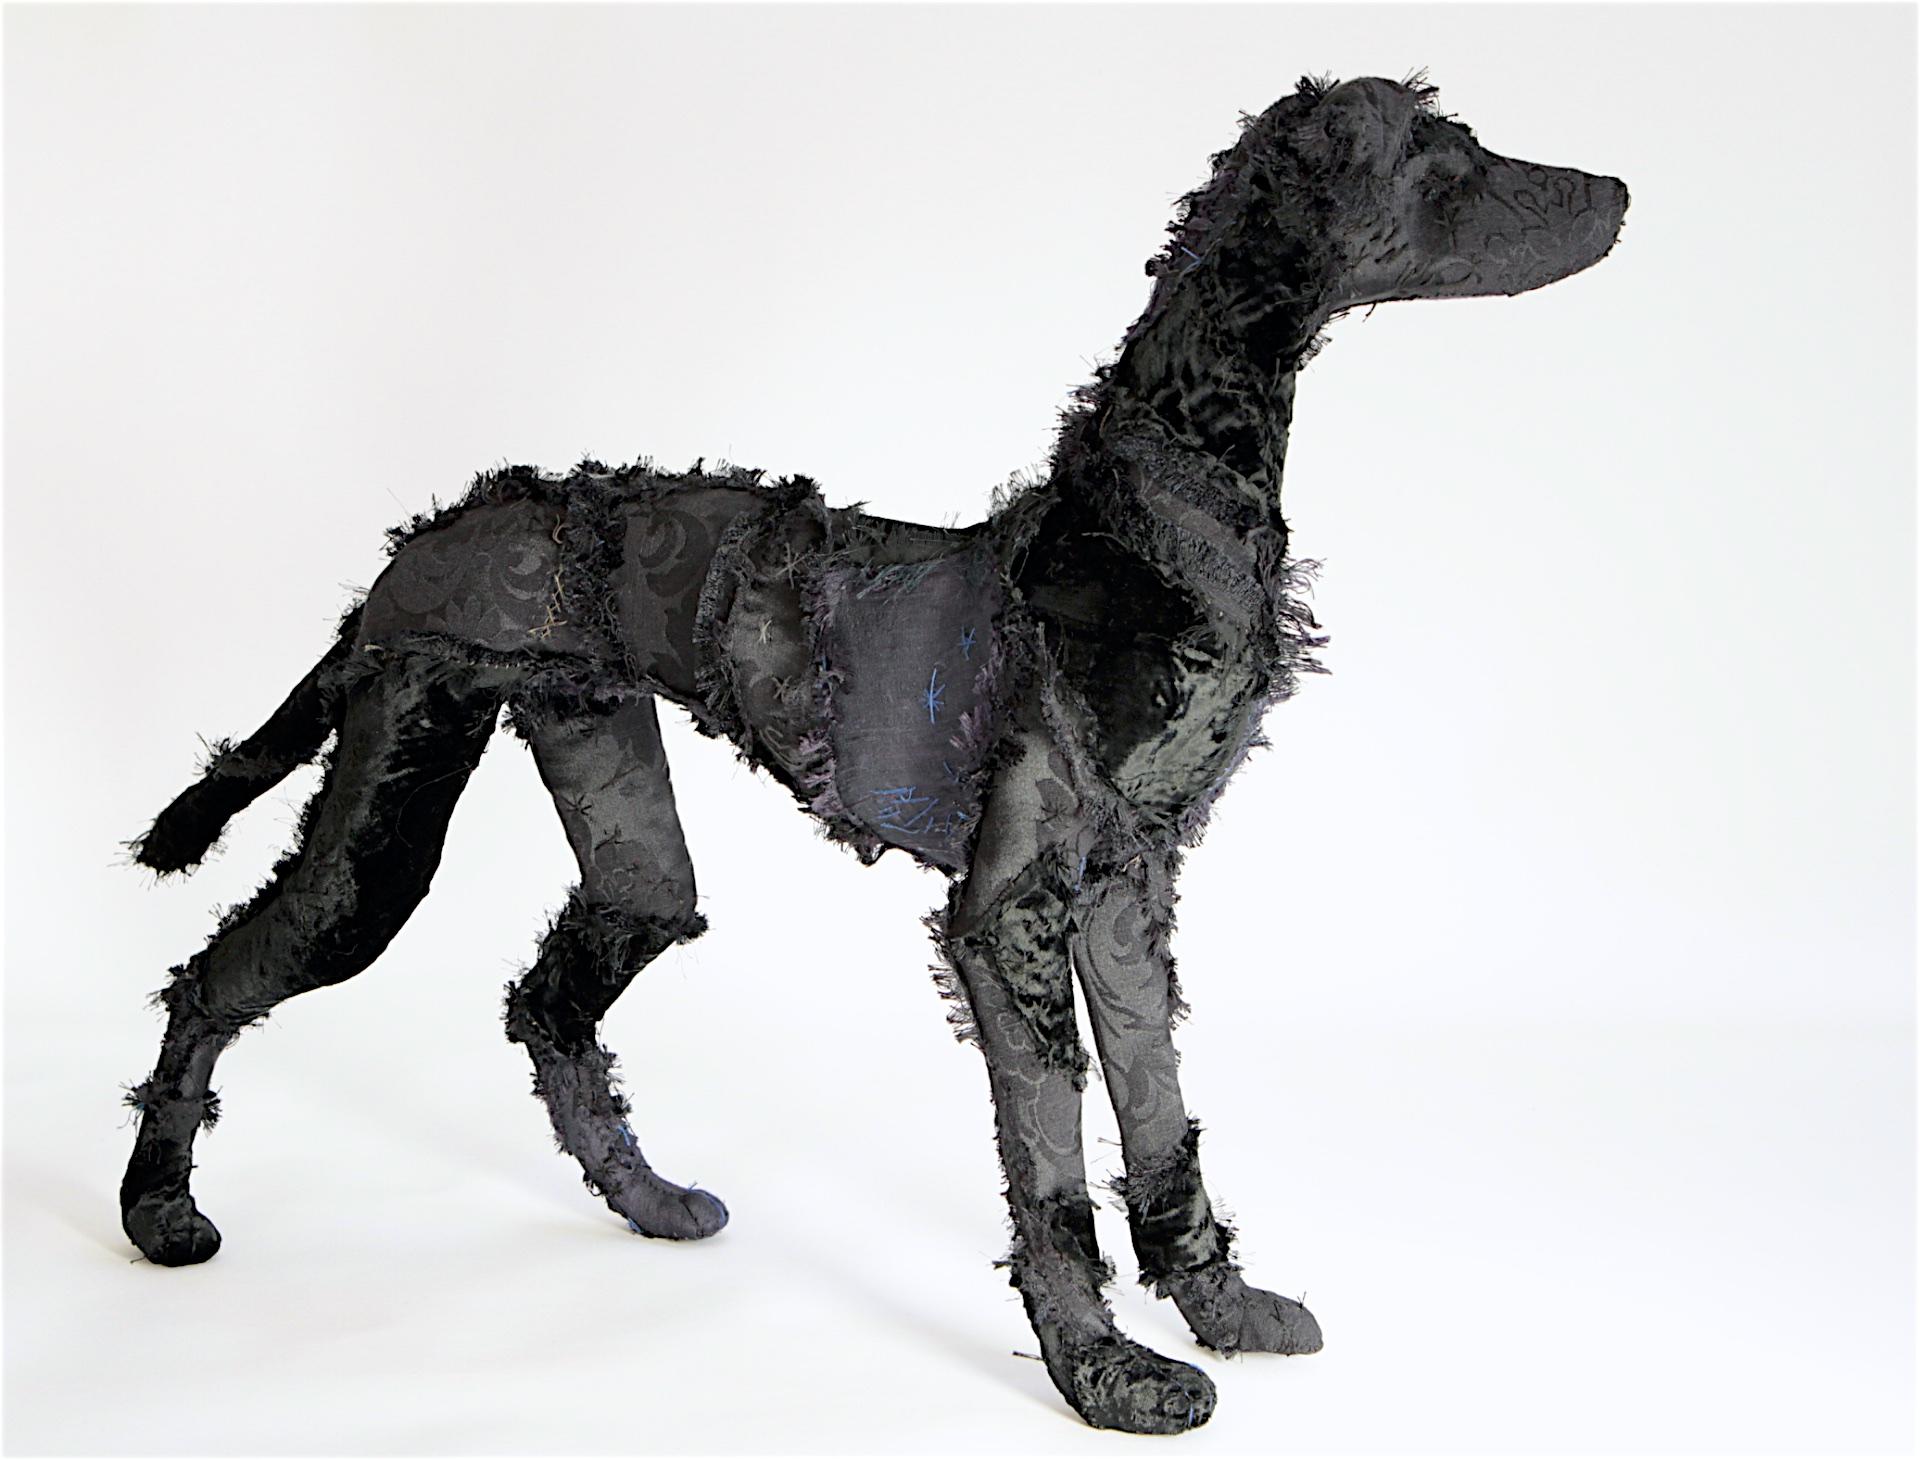 Elegant Black Hound 51cm H x 72cm L x 22cm W